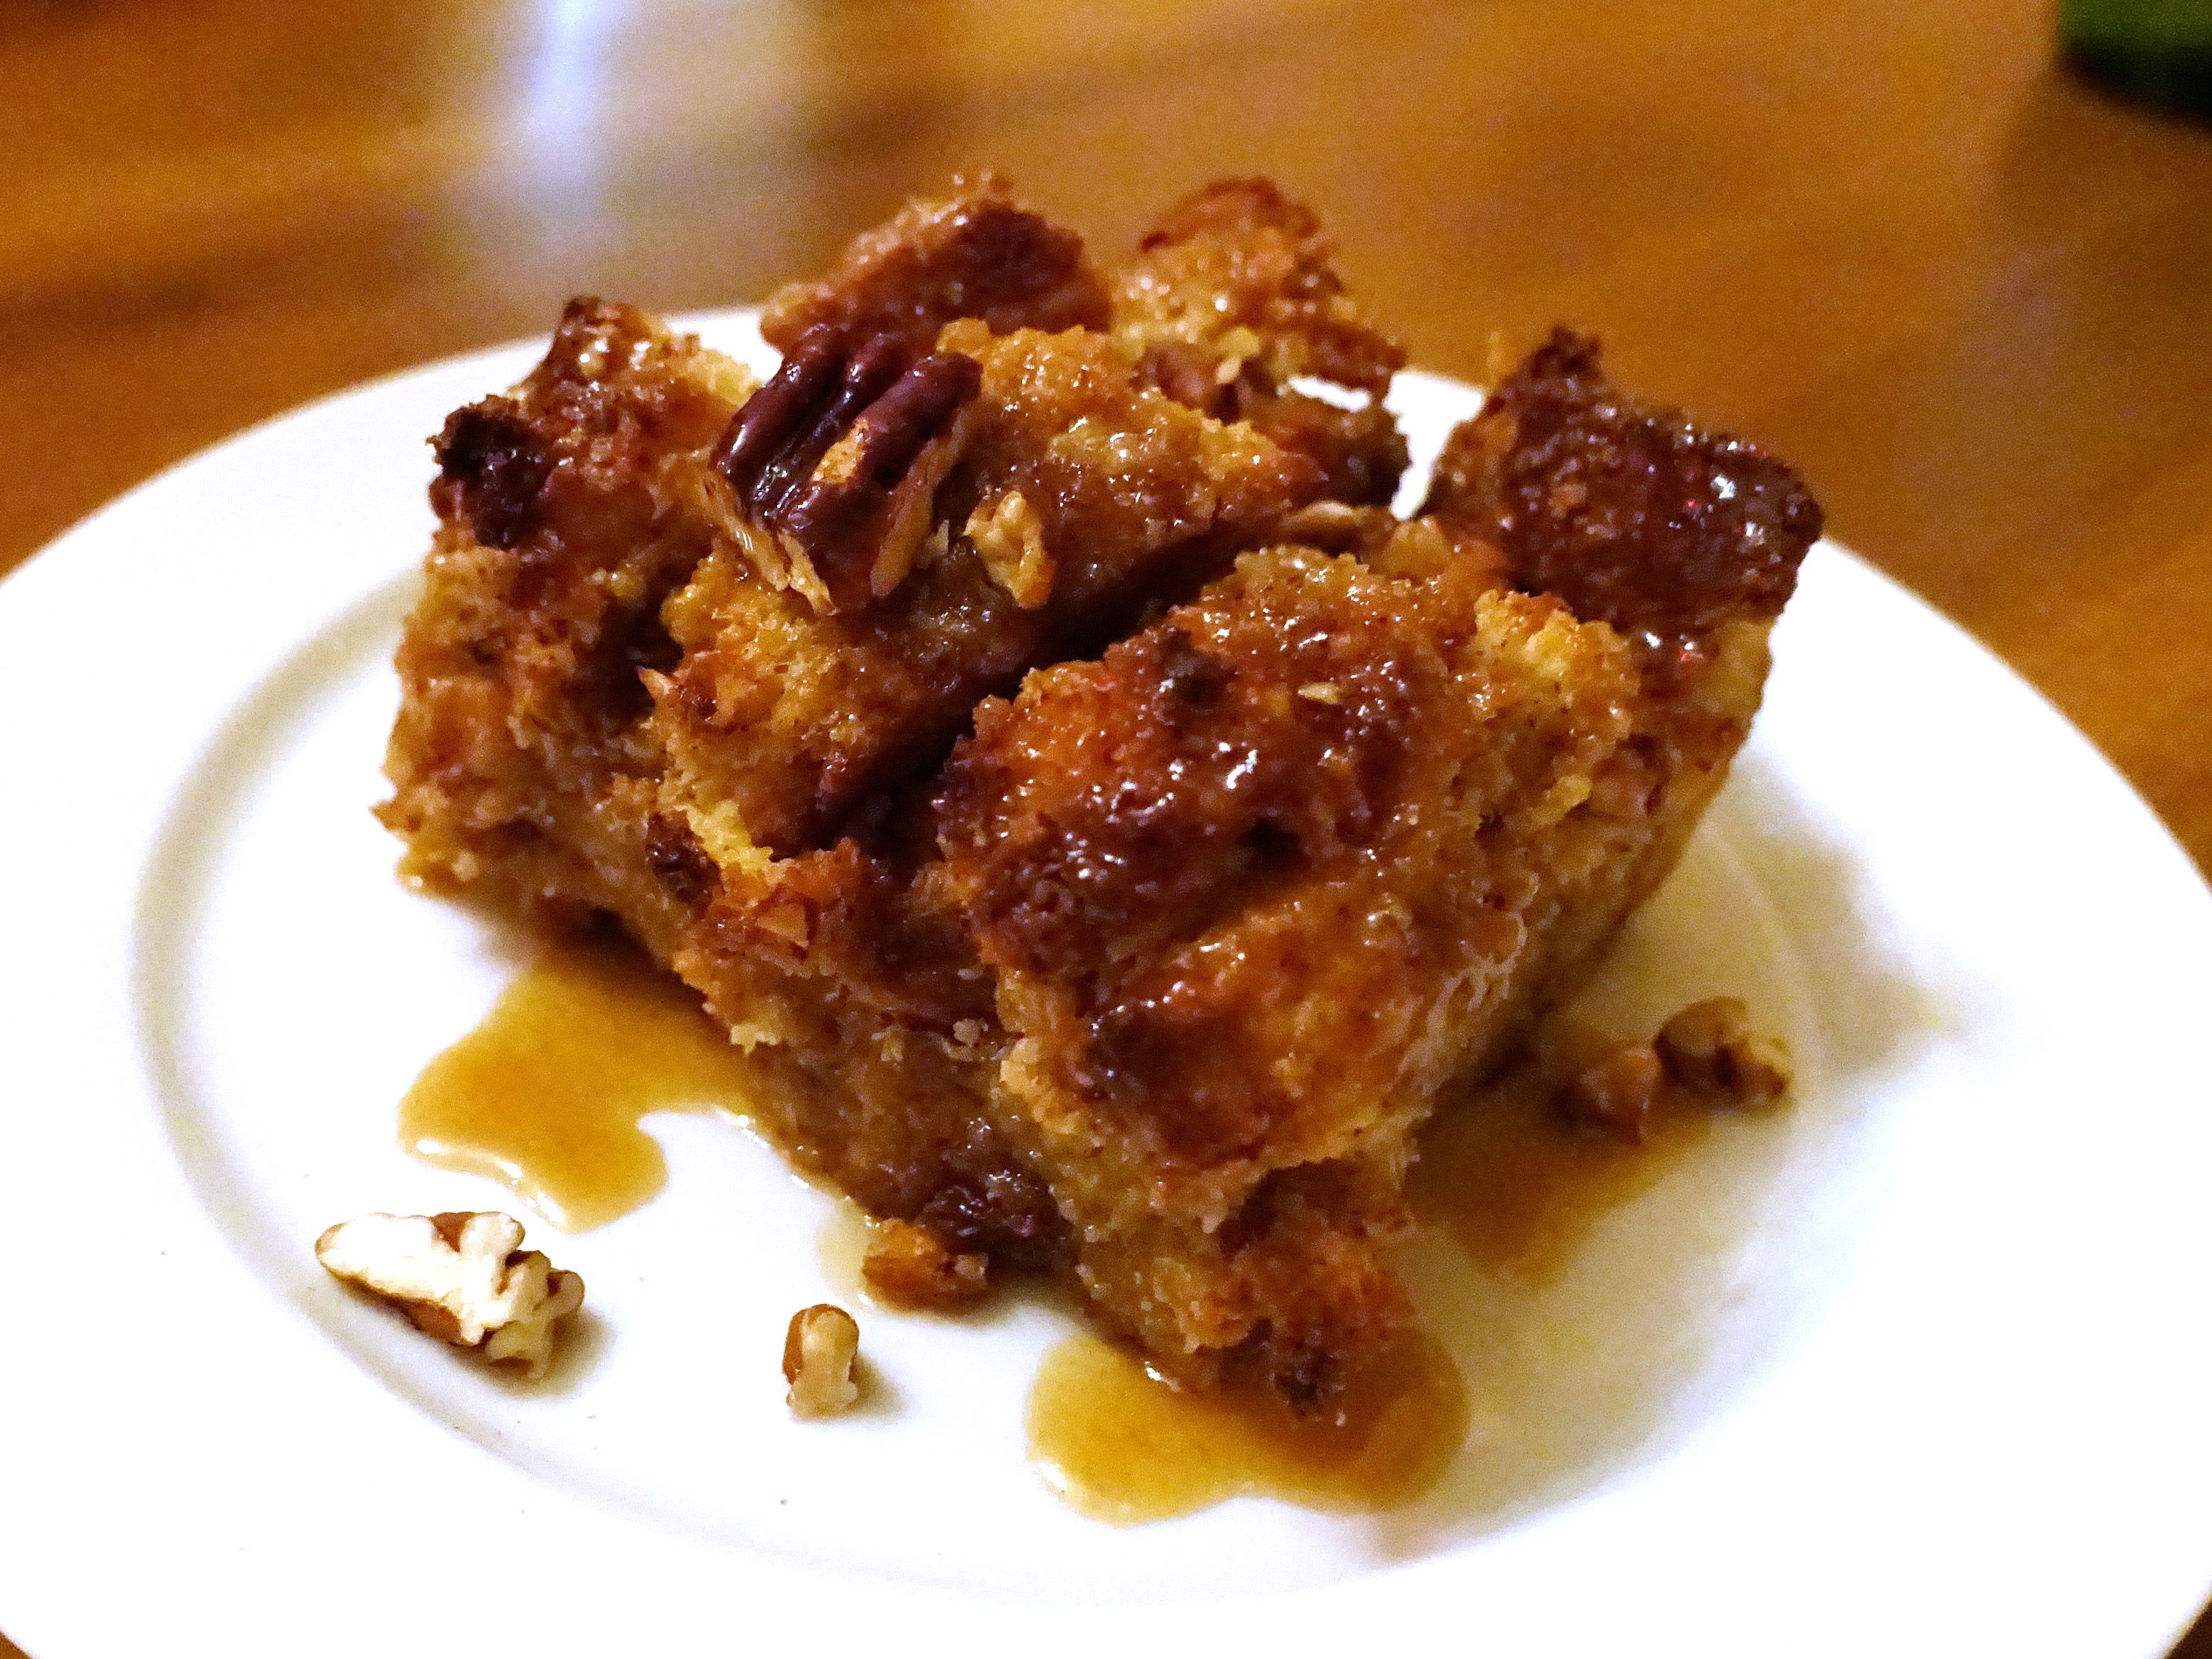 Caramel pecan brioche pudding at The Farish House in Phoenix.